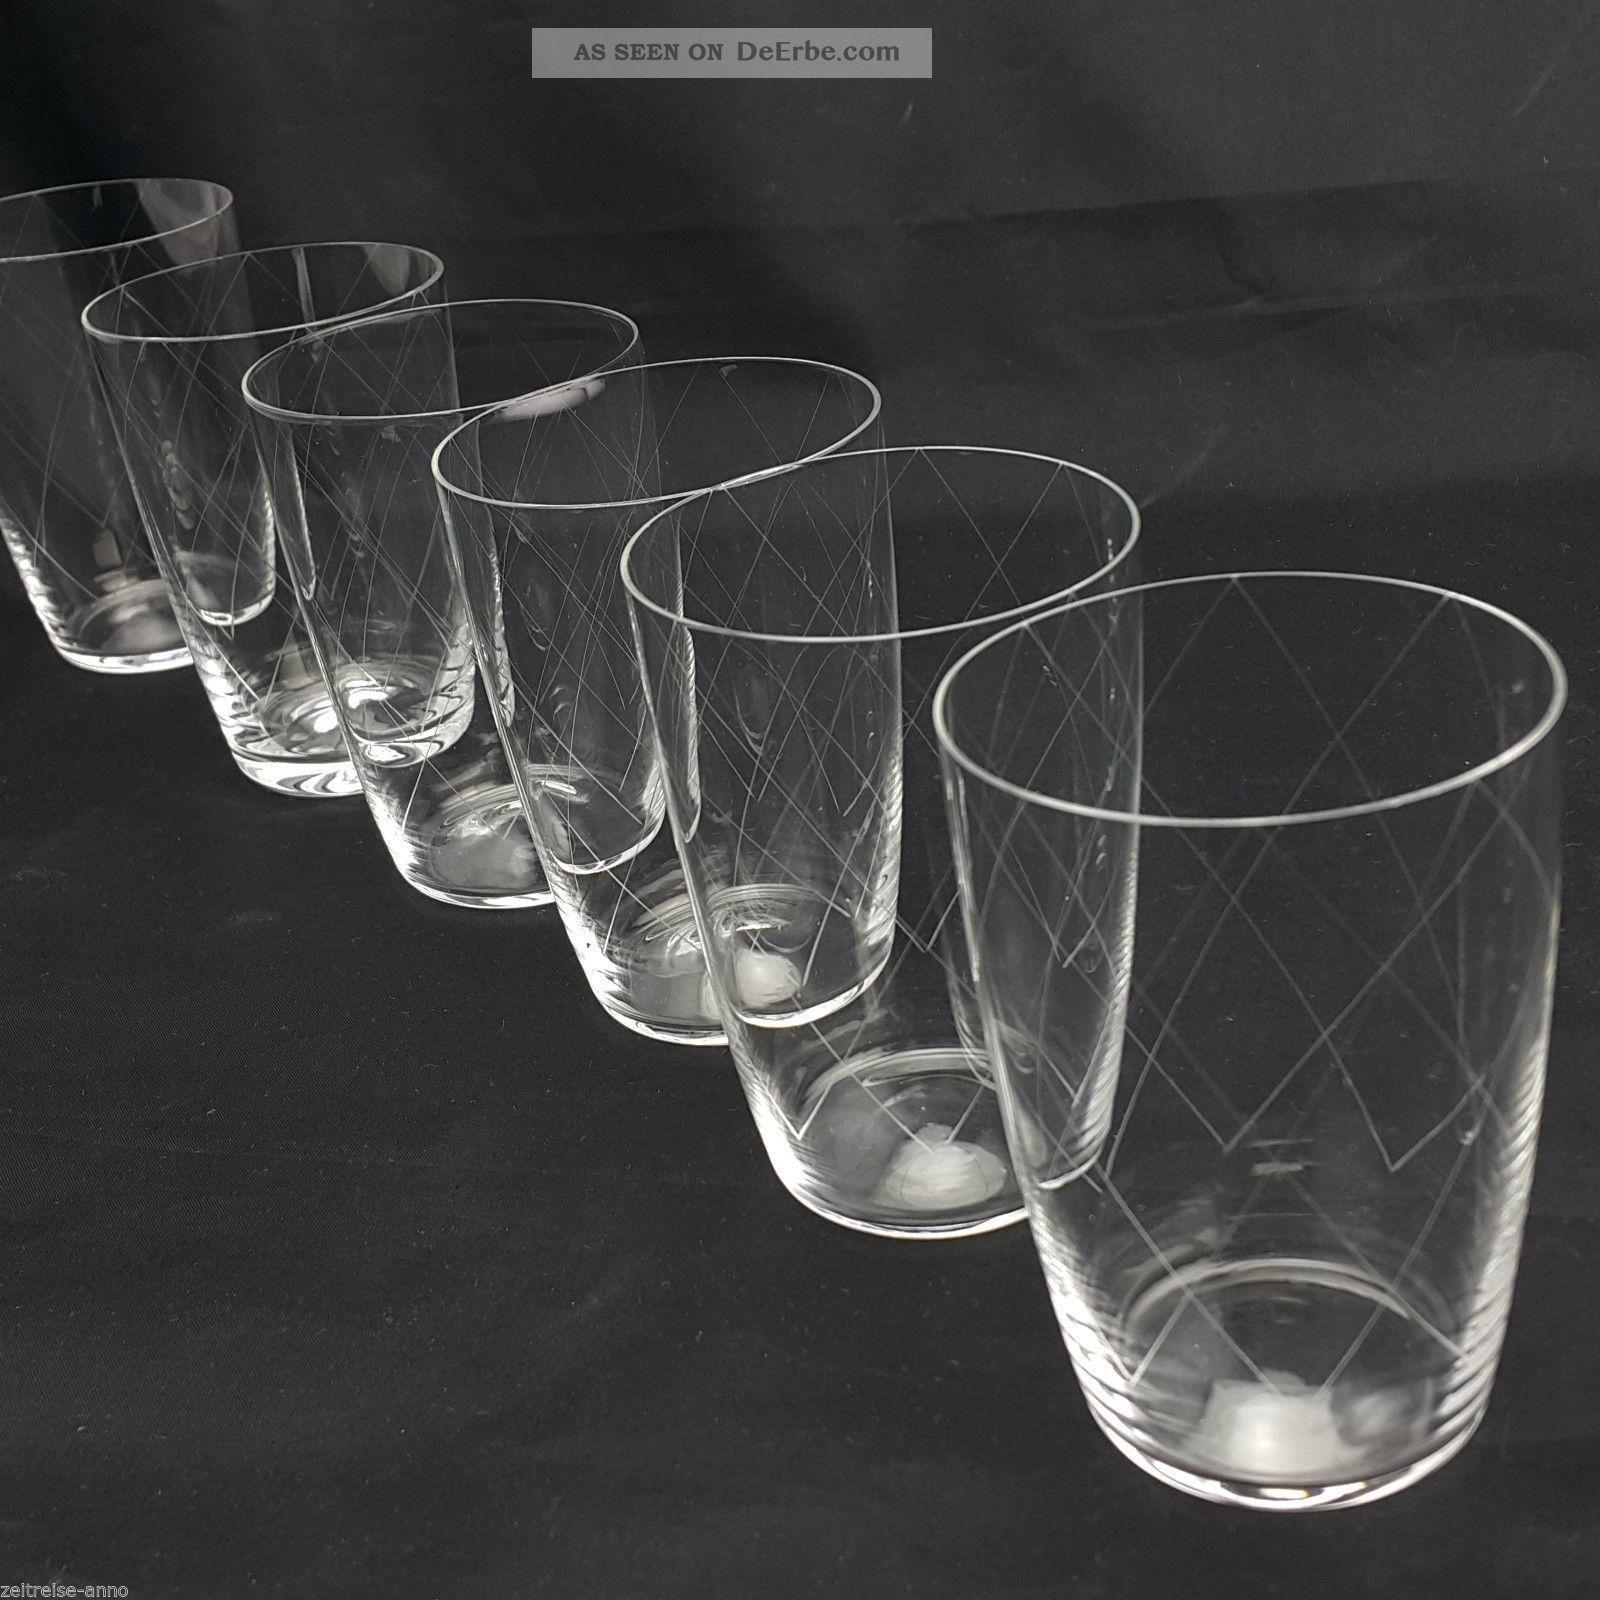 6 Wassergläser Saftgläser Kristall Gral Glashütte Feiner Rautenschliff Kristall Bild